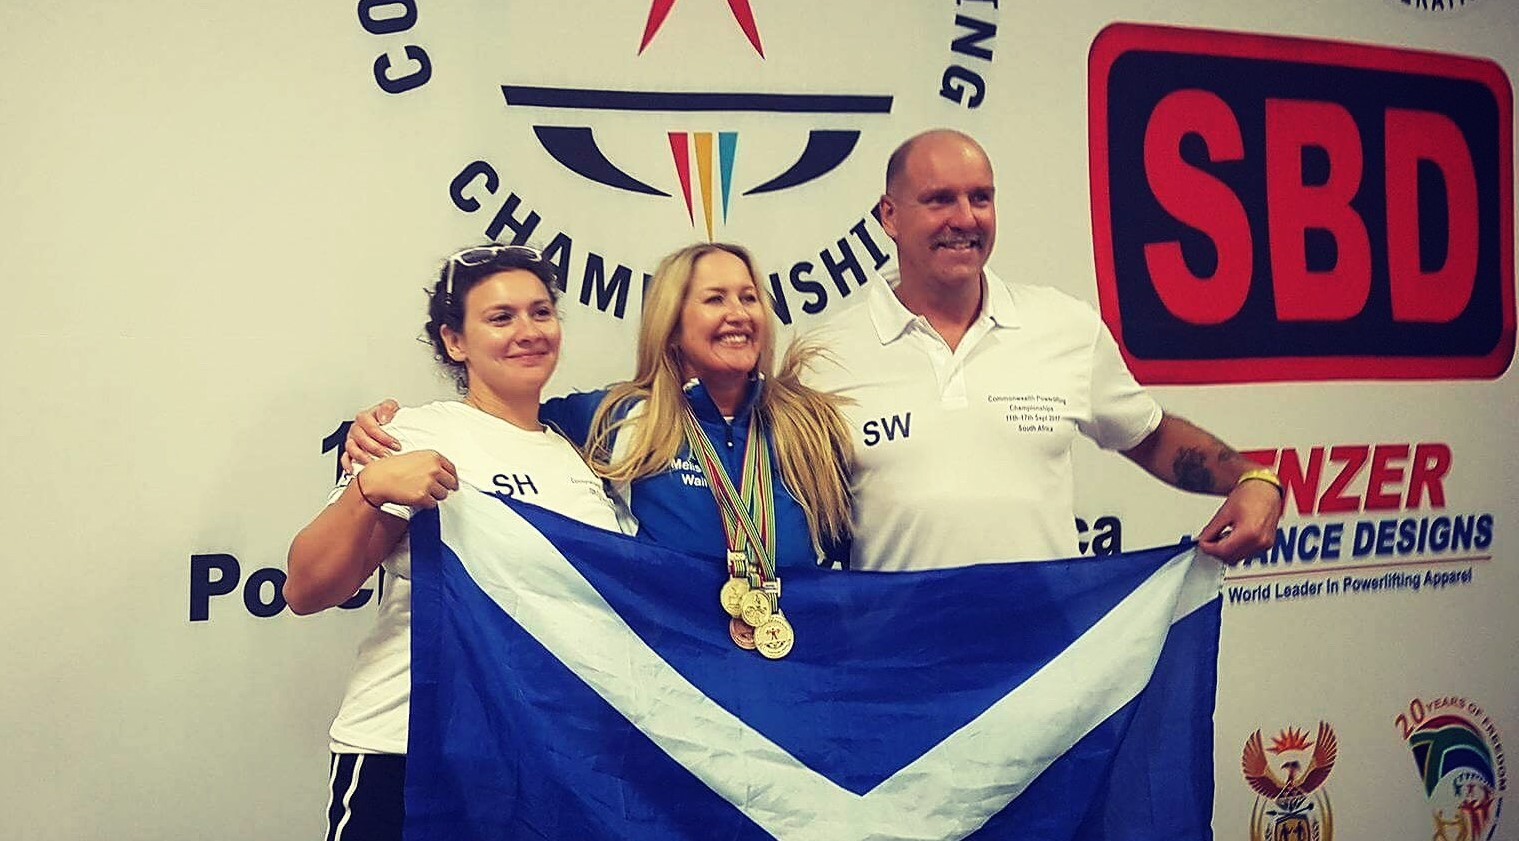 Blog 47: Scottish Powerlifting Queen